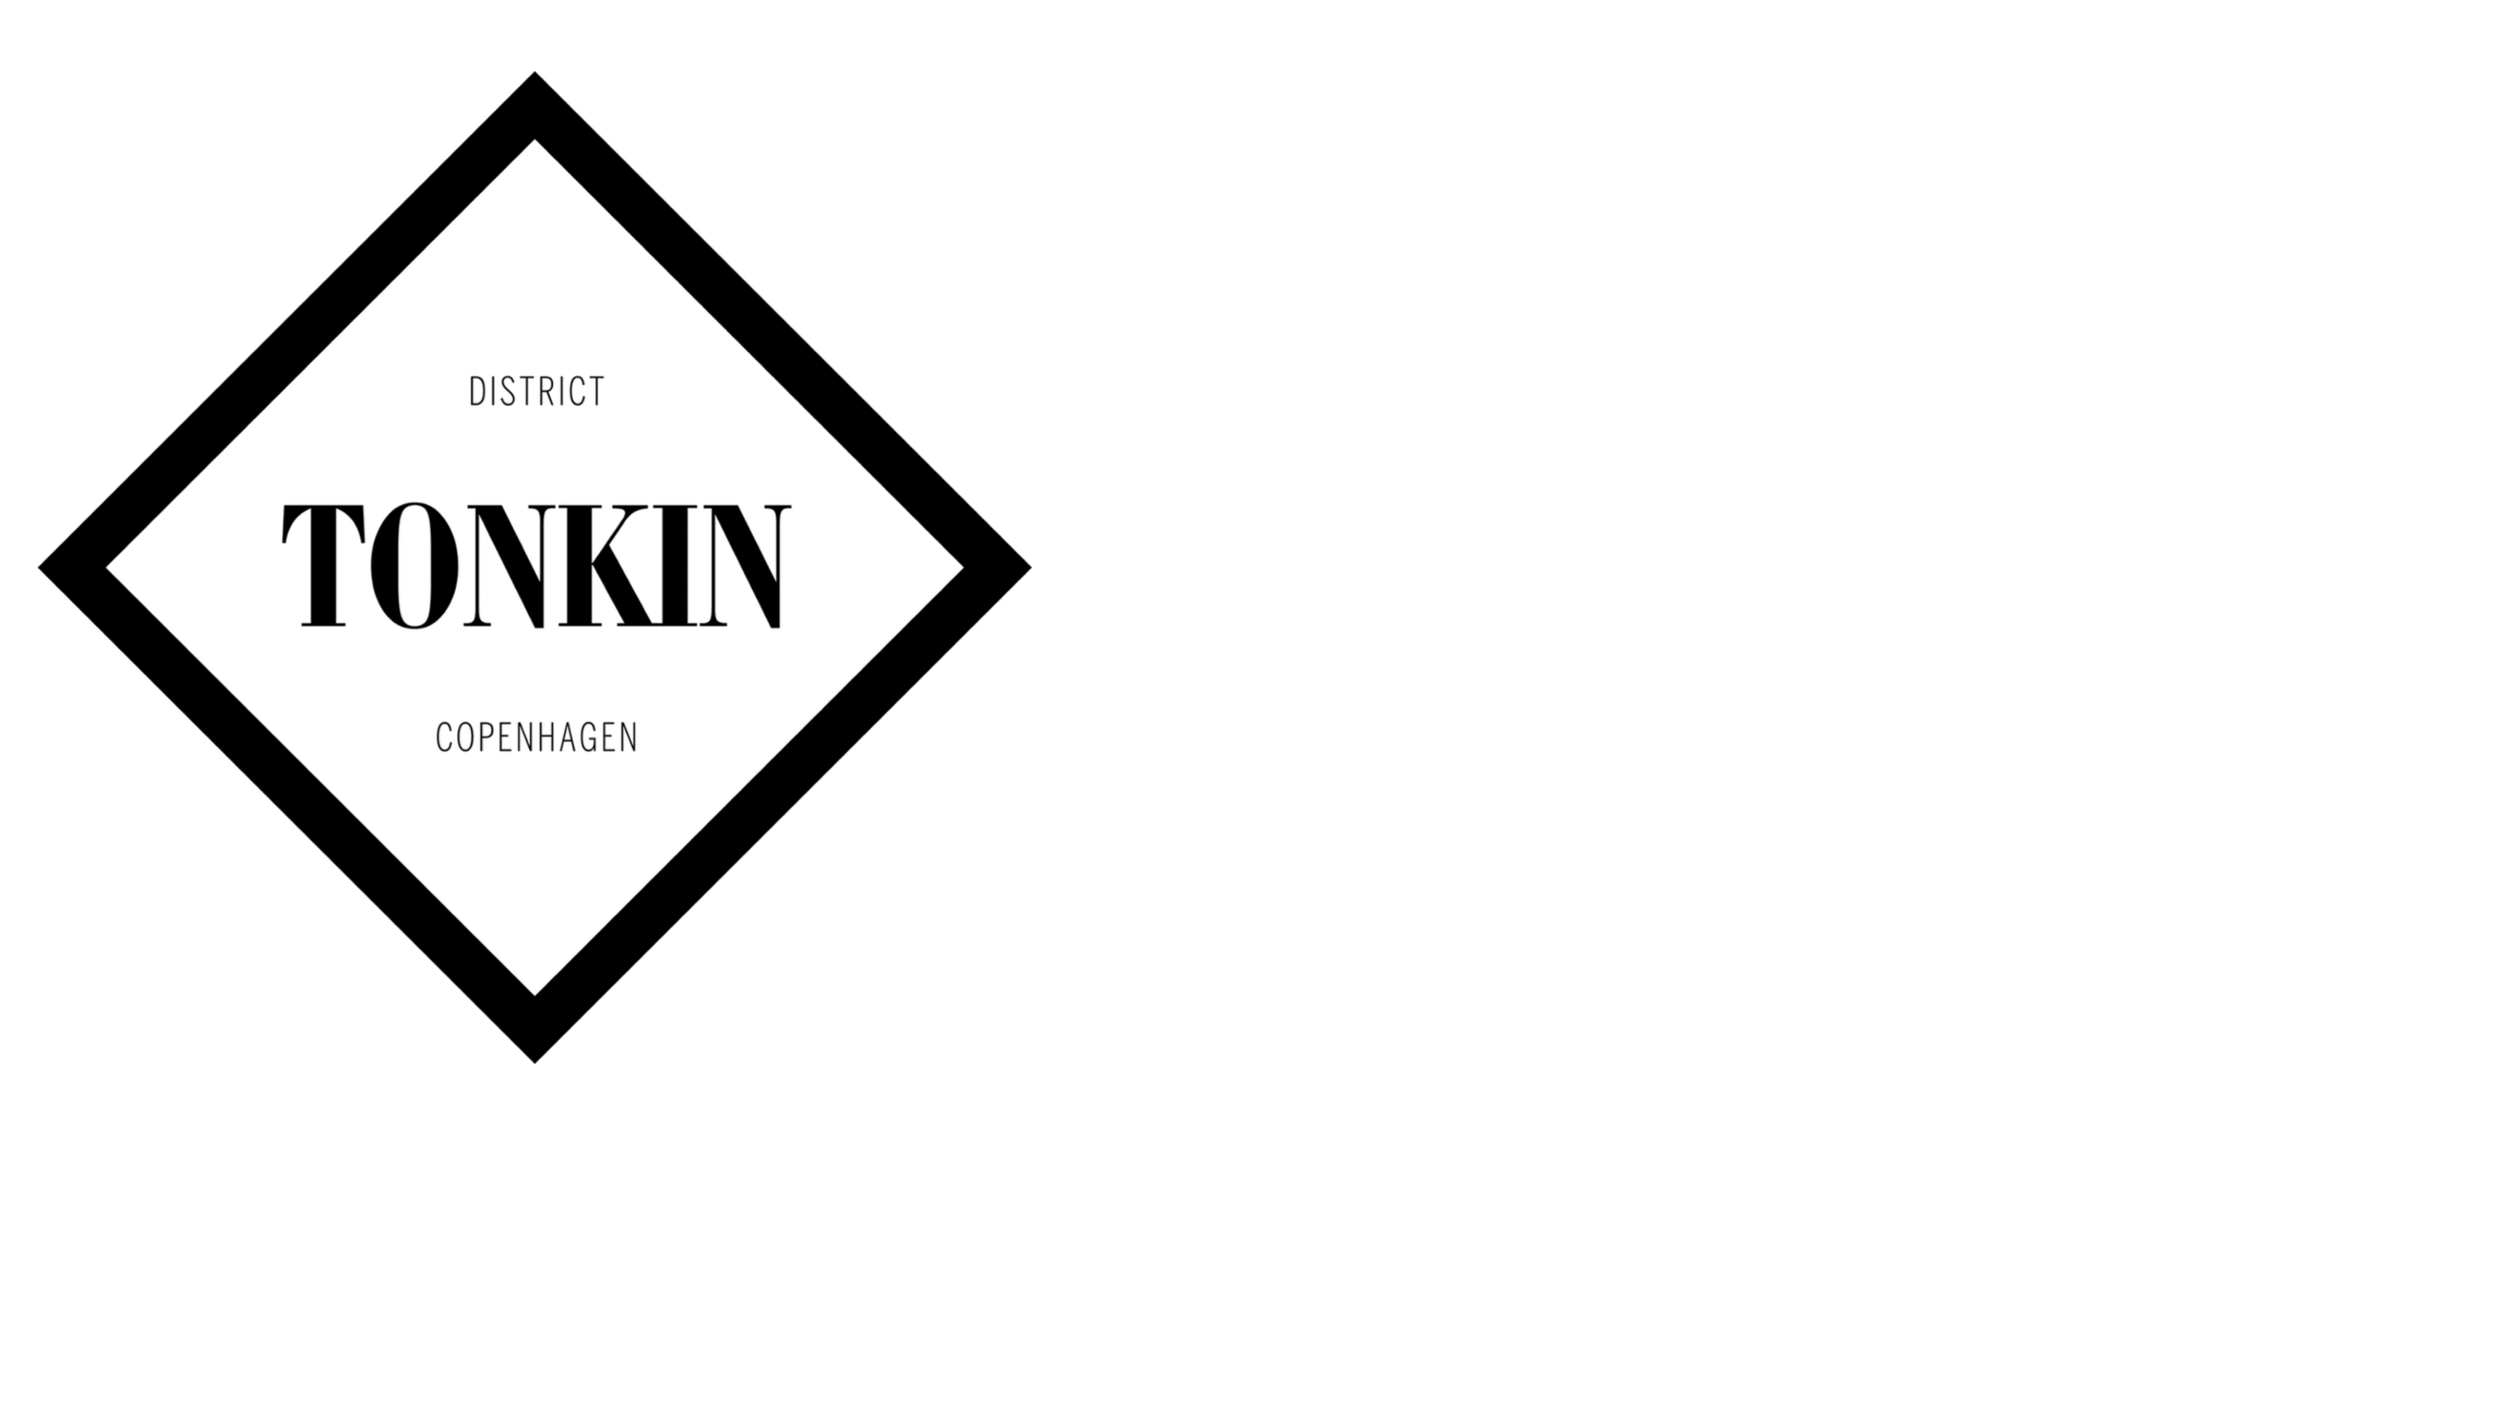 logoweb-kopi 222 2.png